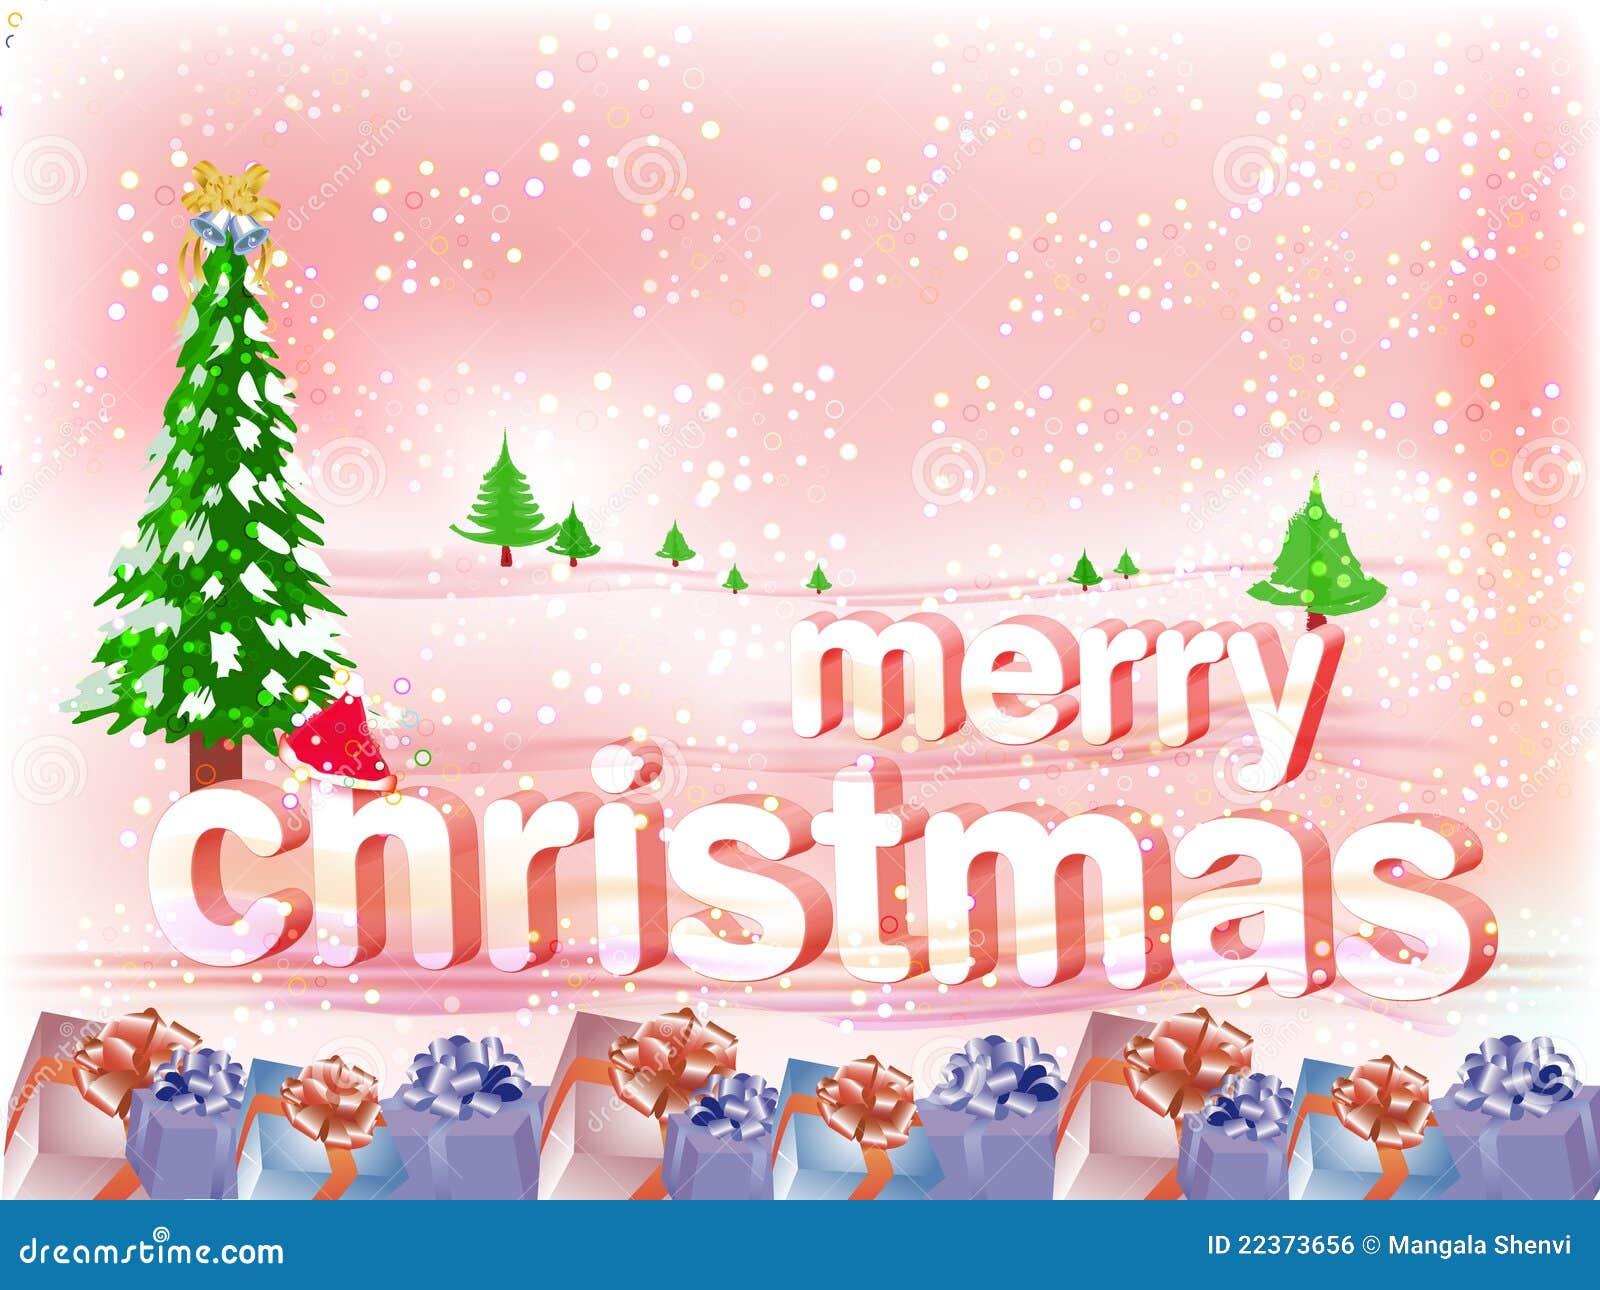 Merry Christmas Wallpaper.Merry Christmas Wallpaper Stock Vector Illustration Of